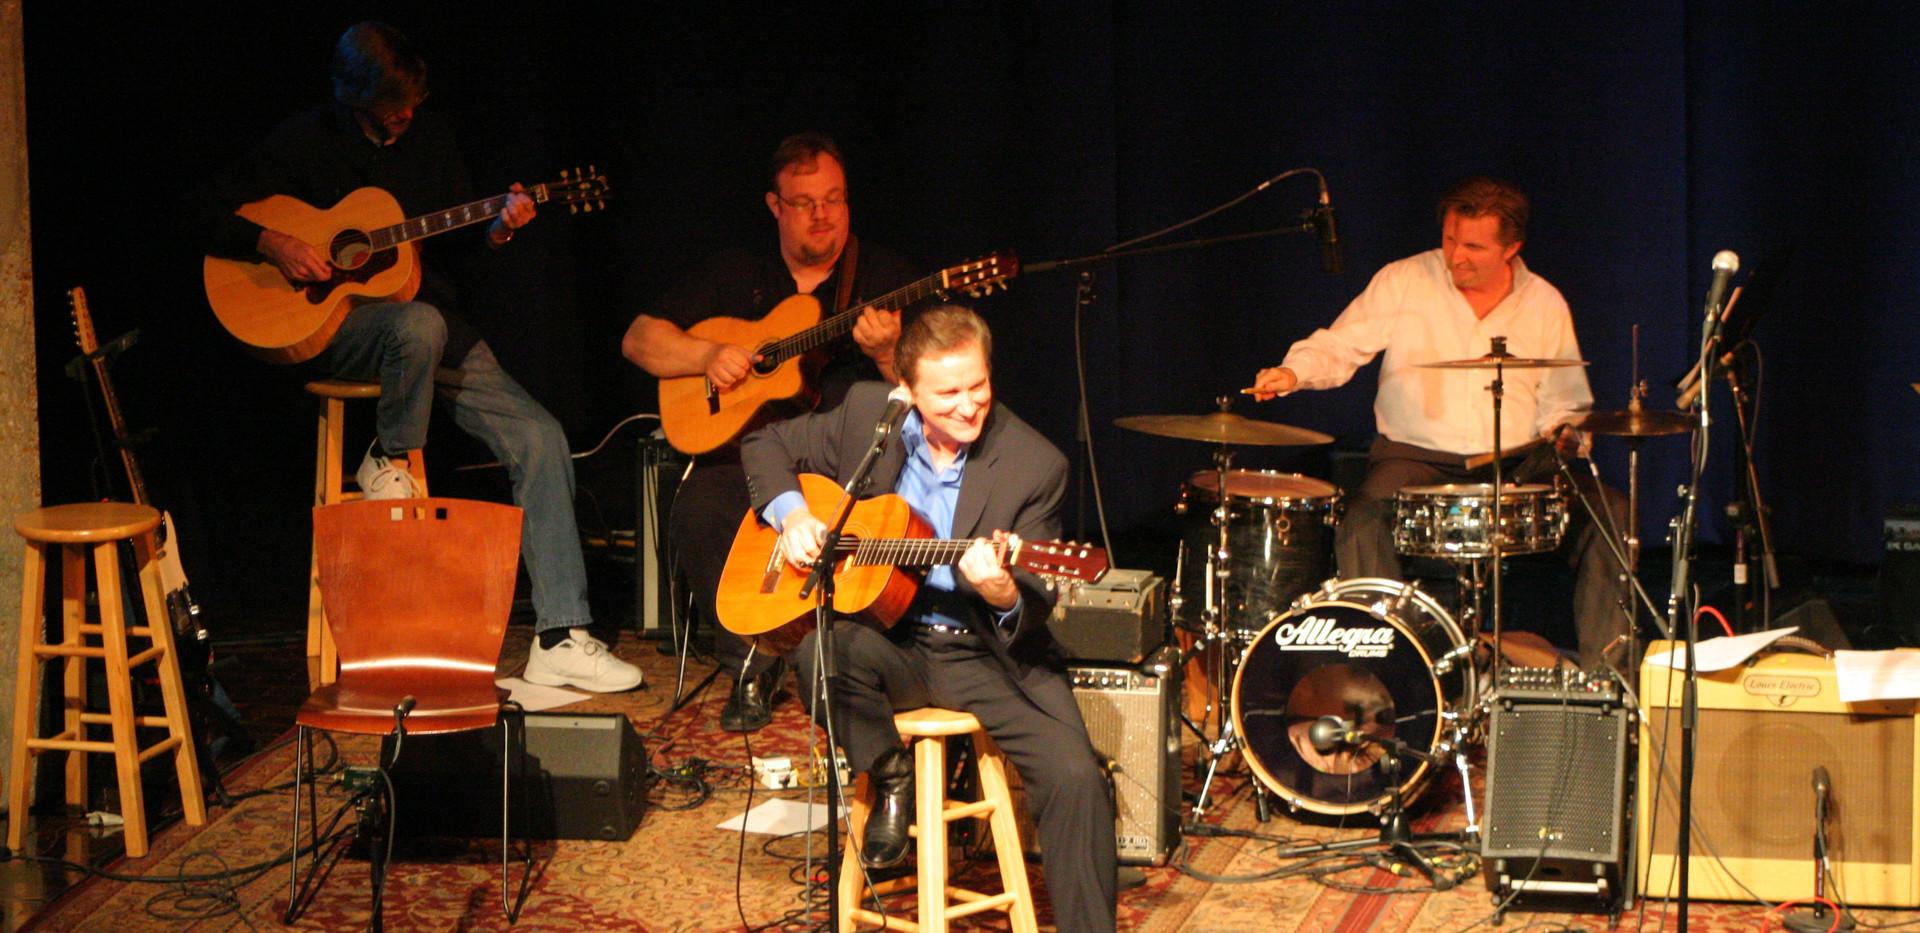 Darrell Toney & Ric McClure, Craig Dobbi